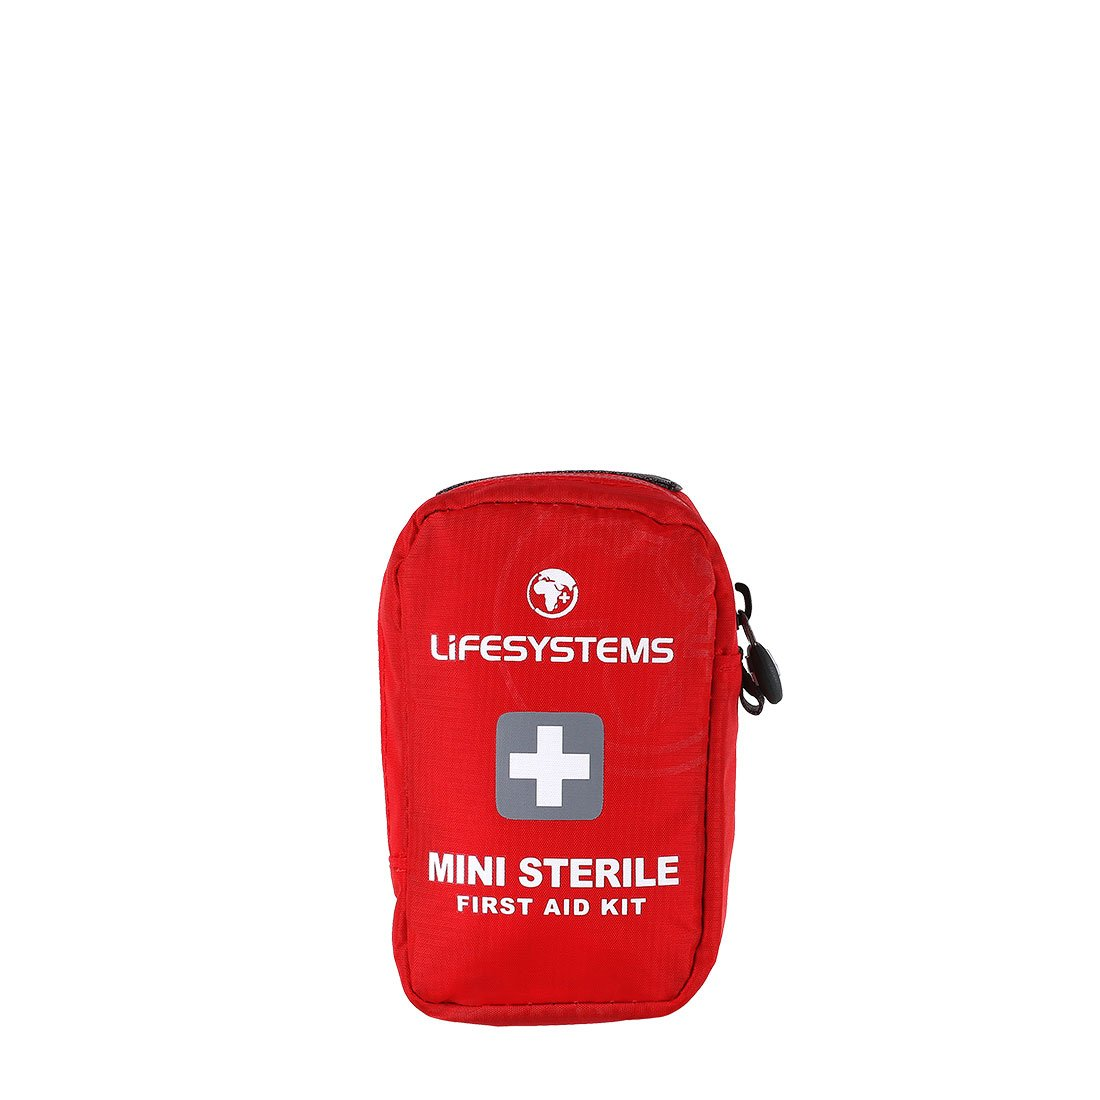 Mini Sterile First Aid Kit Small Lifesystems Nurse Standart